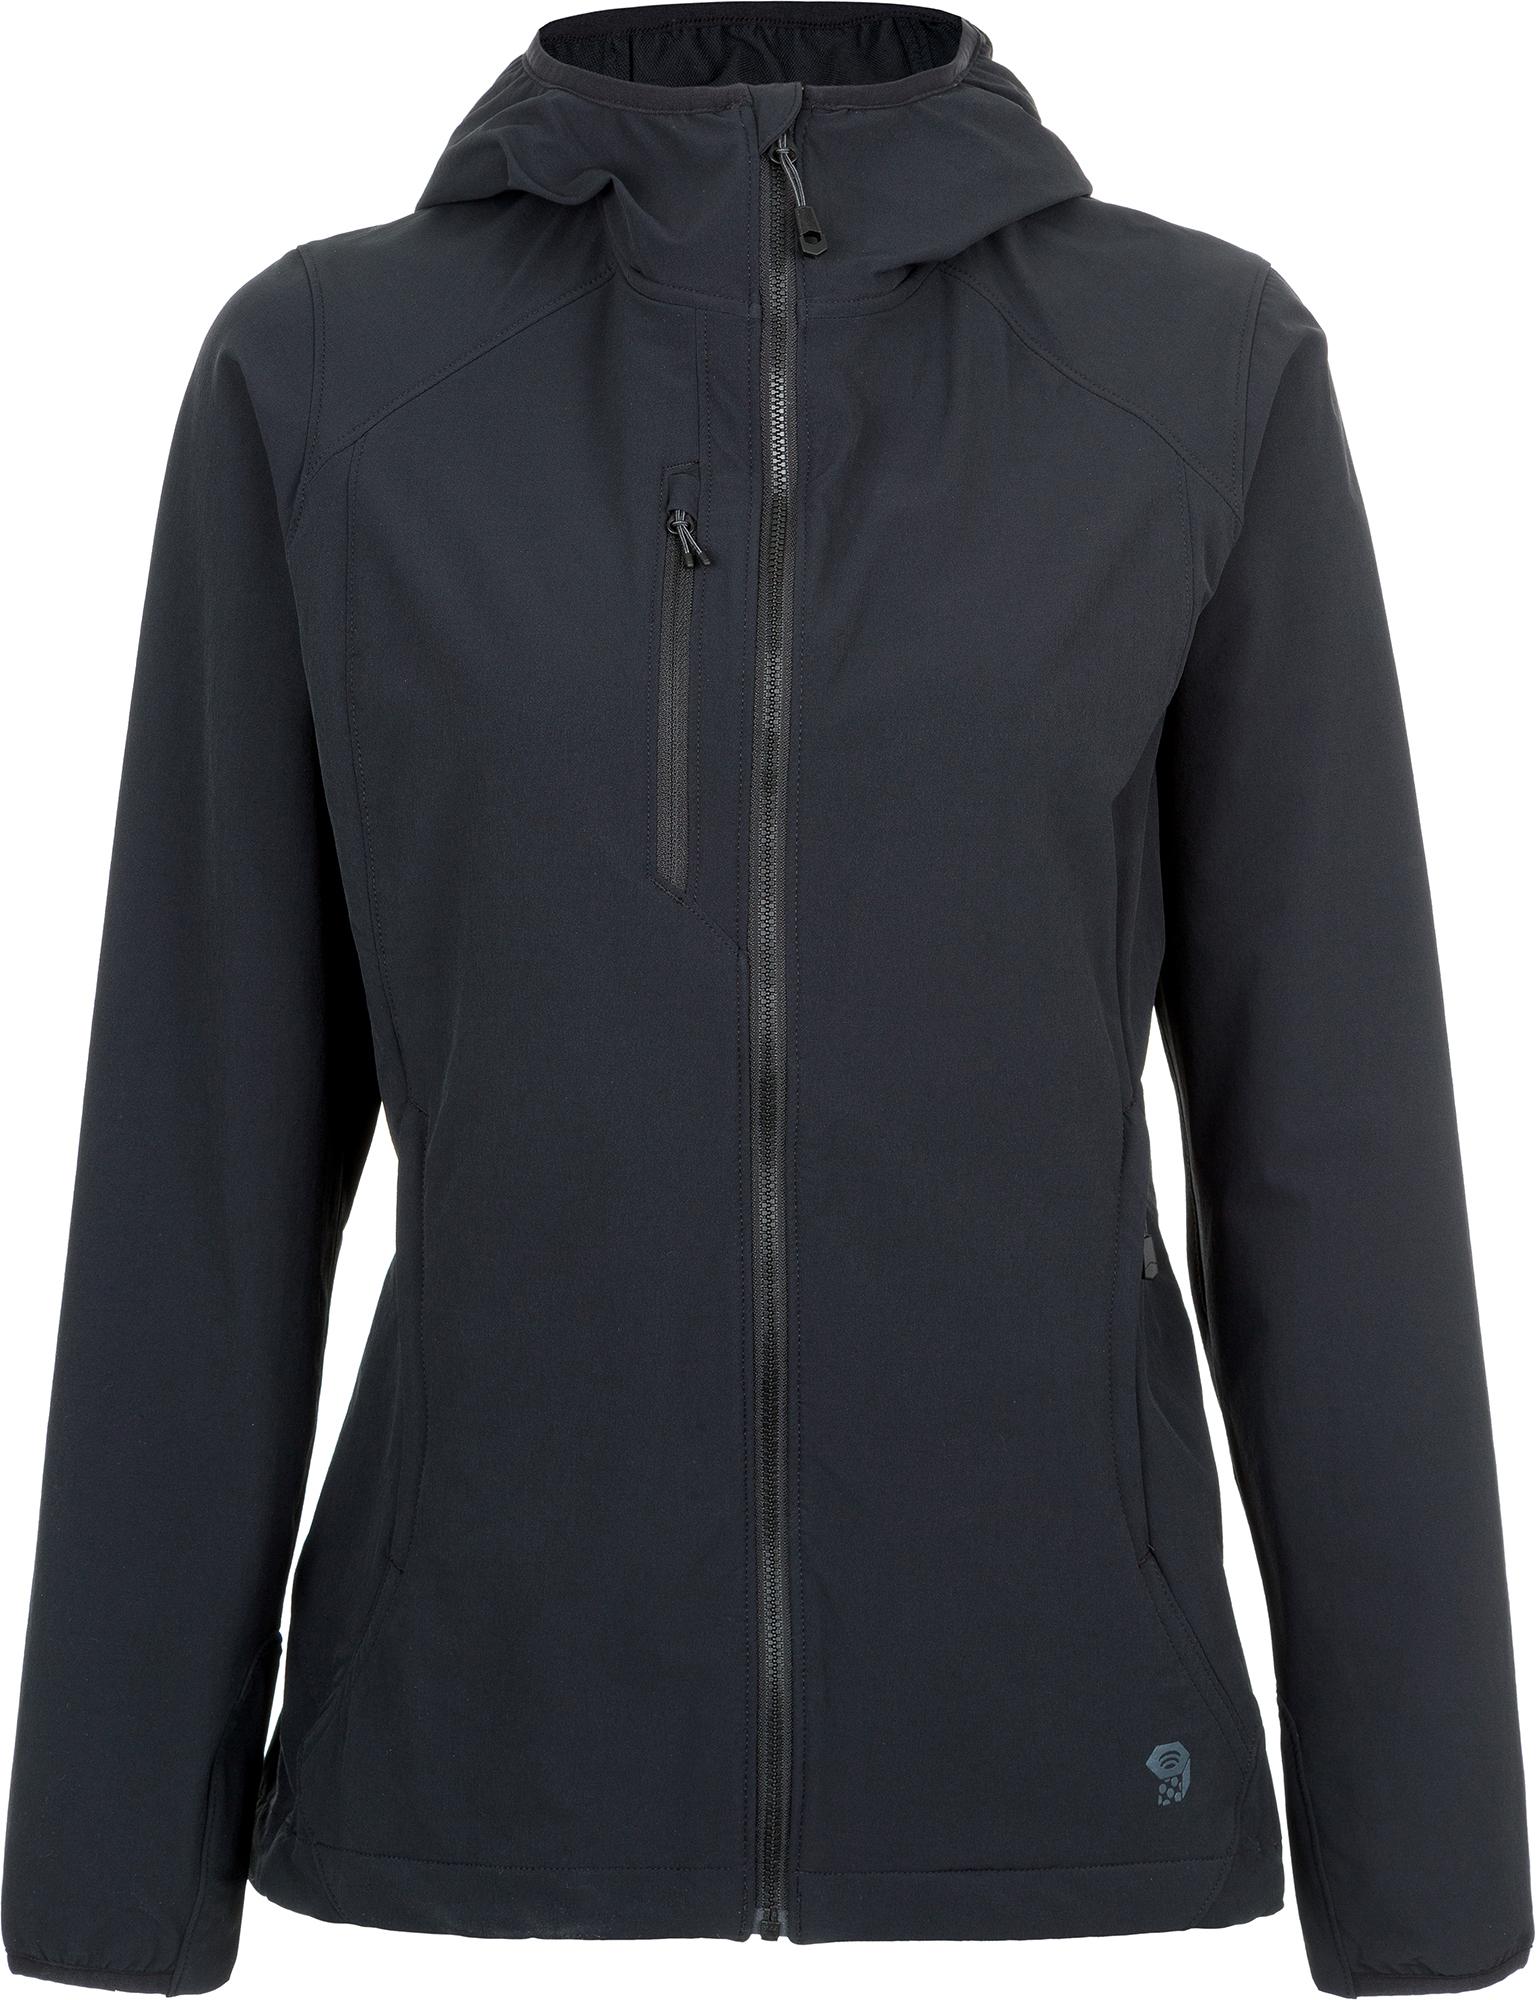 цена на Mountain Hardwear Ветровка женская Mountain Hardwear Super Chockstone, размер 48